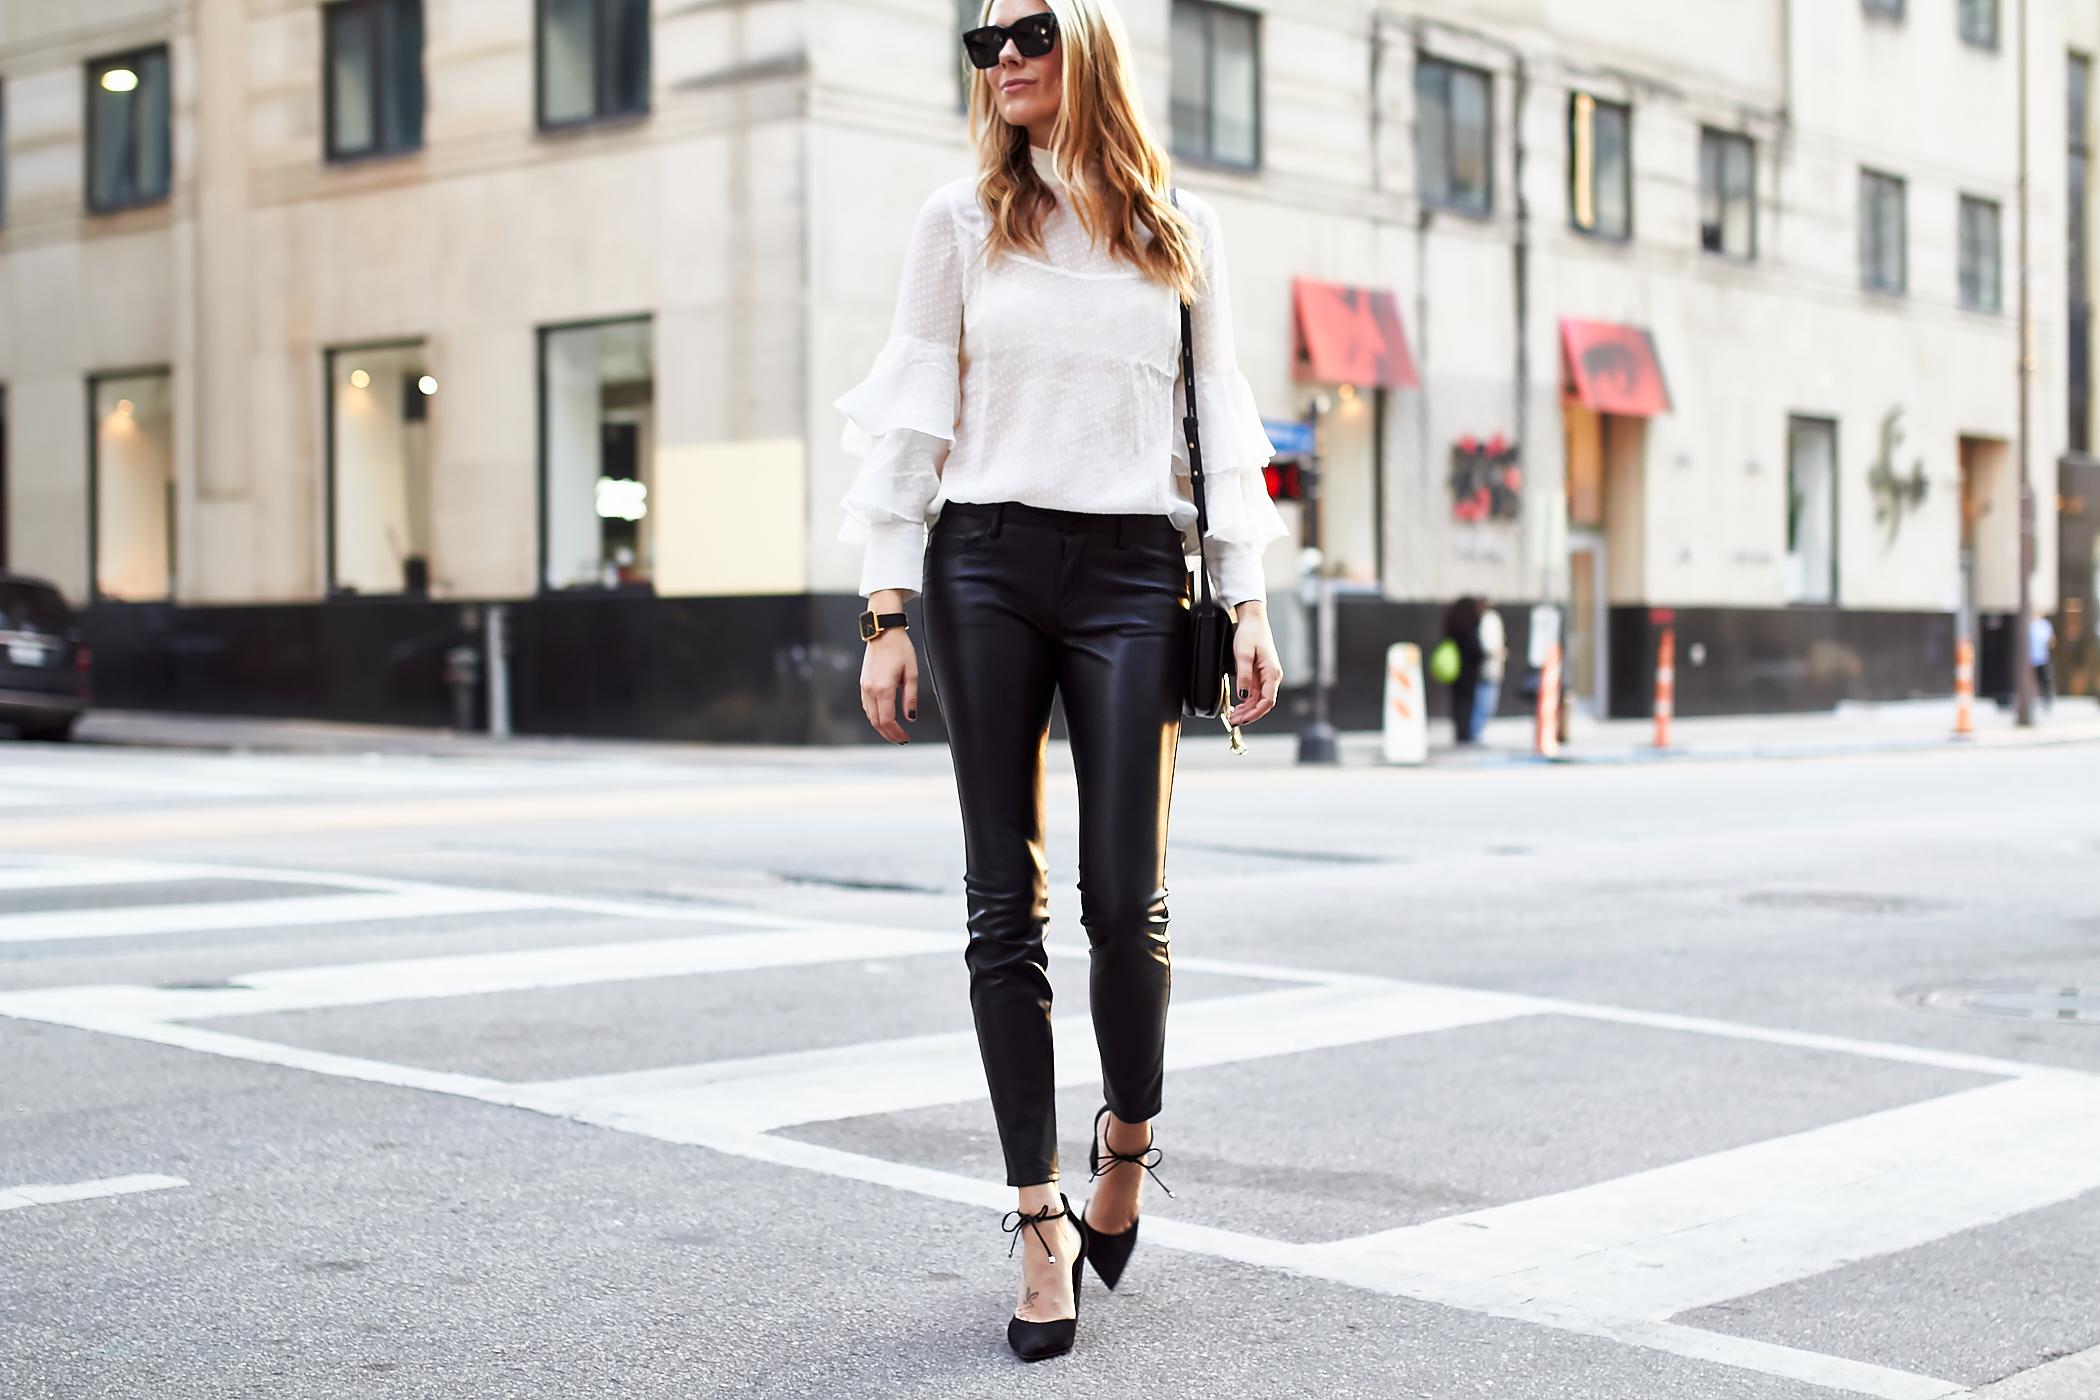 fashion-jackson-white-ruffle-sleeve-blouse-black-faux-leather-skinny-pants